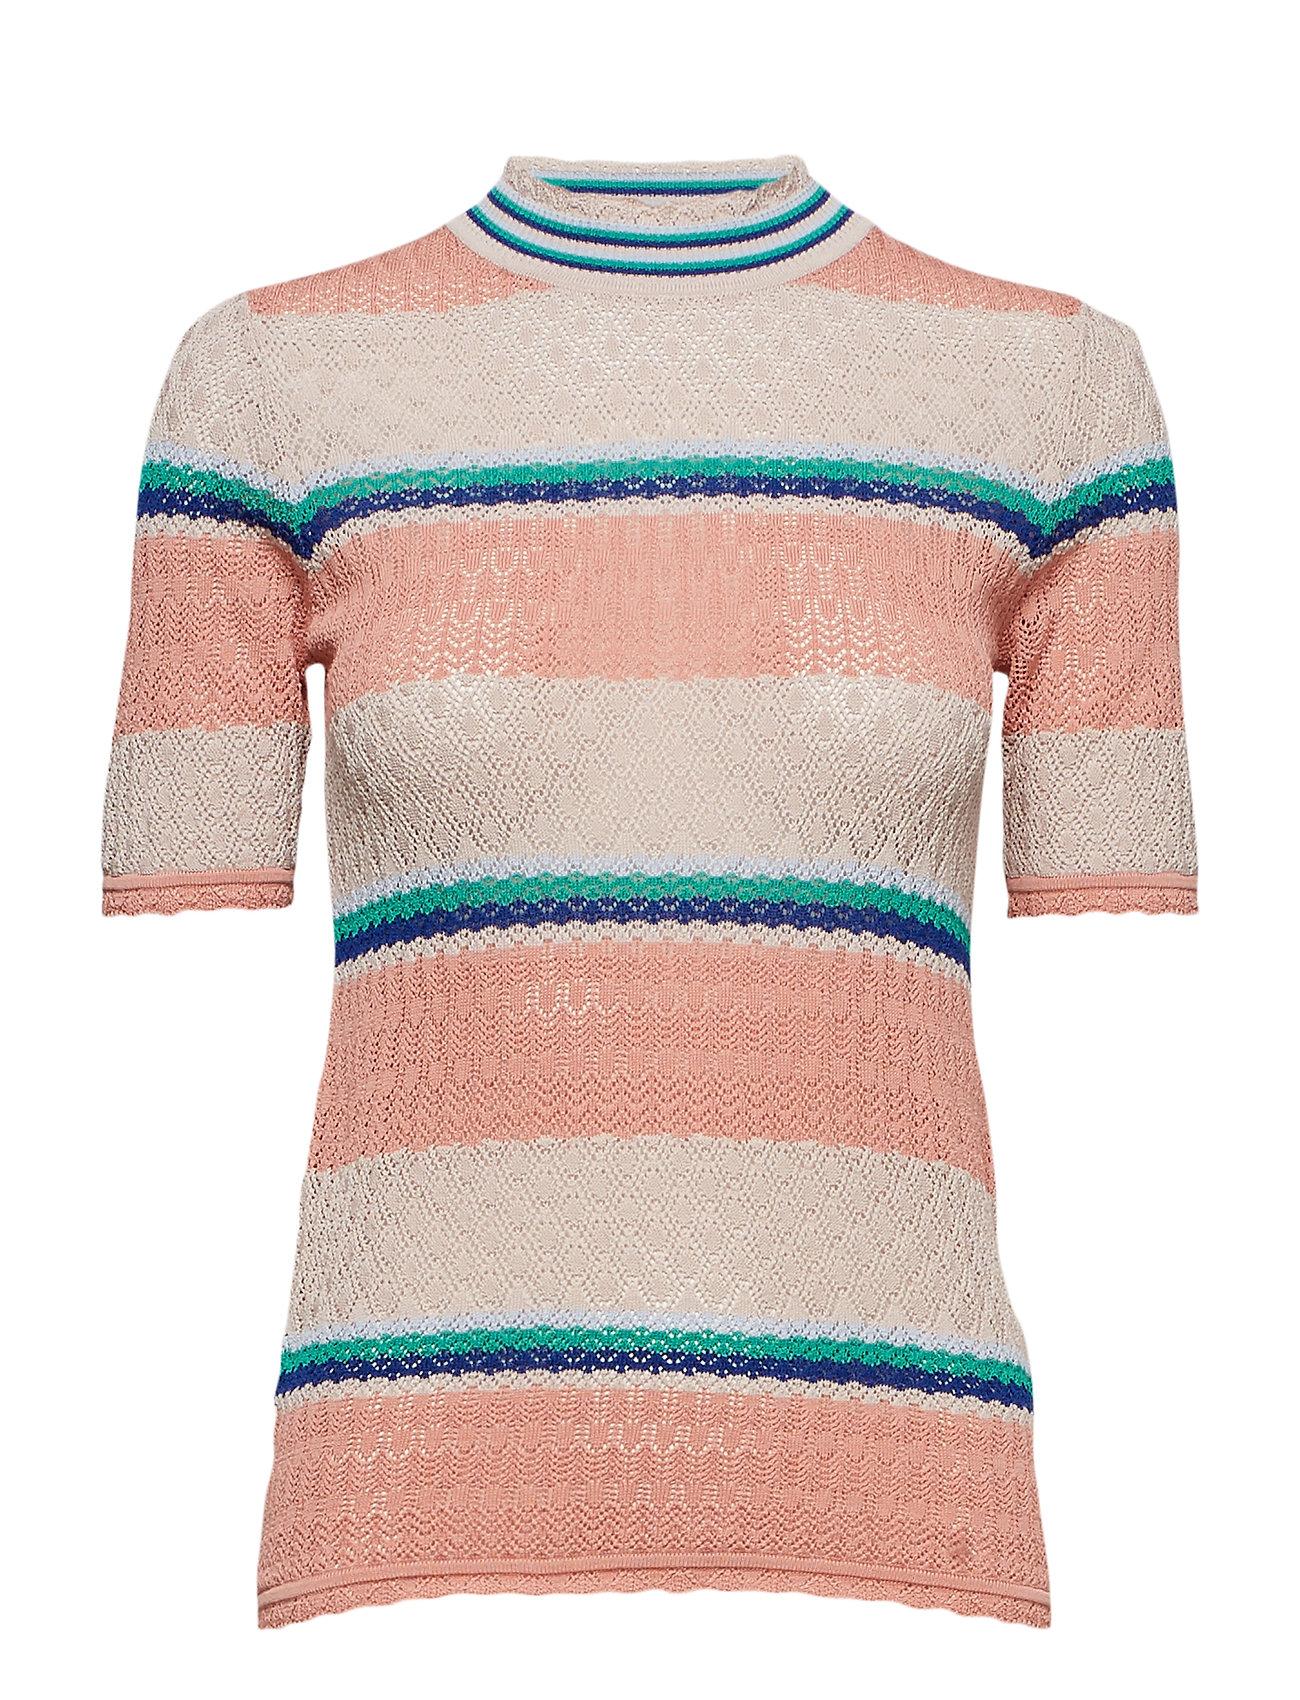 T shirt 10978rose StSamsøeamp; Tan Rho PXN0knO8w